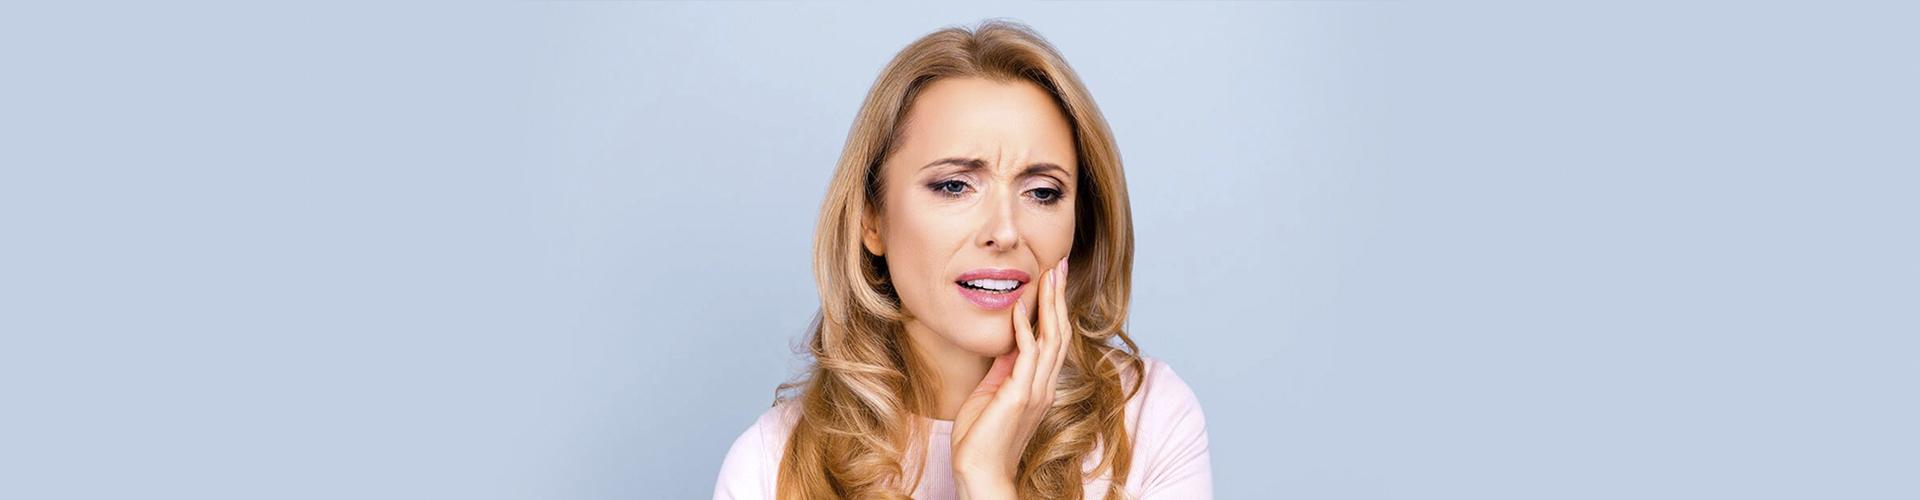 Temporomandibular Joints